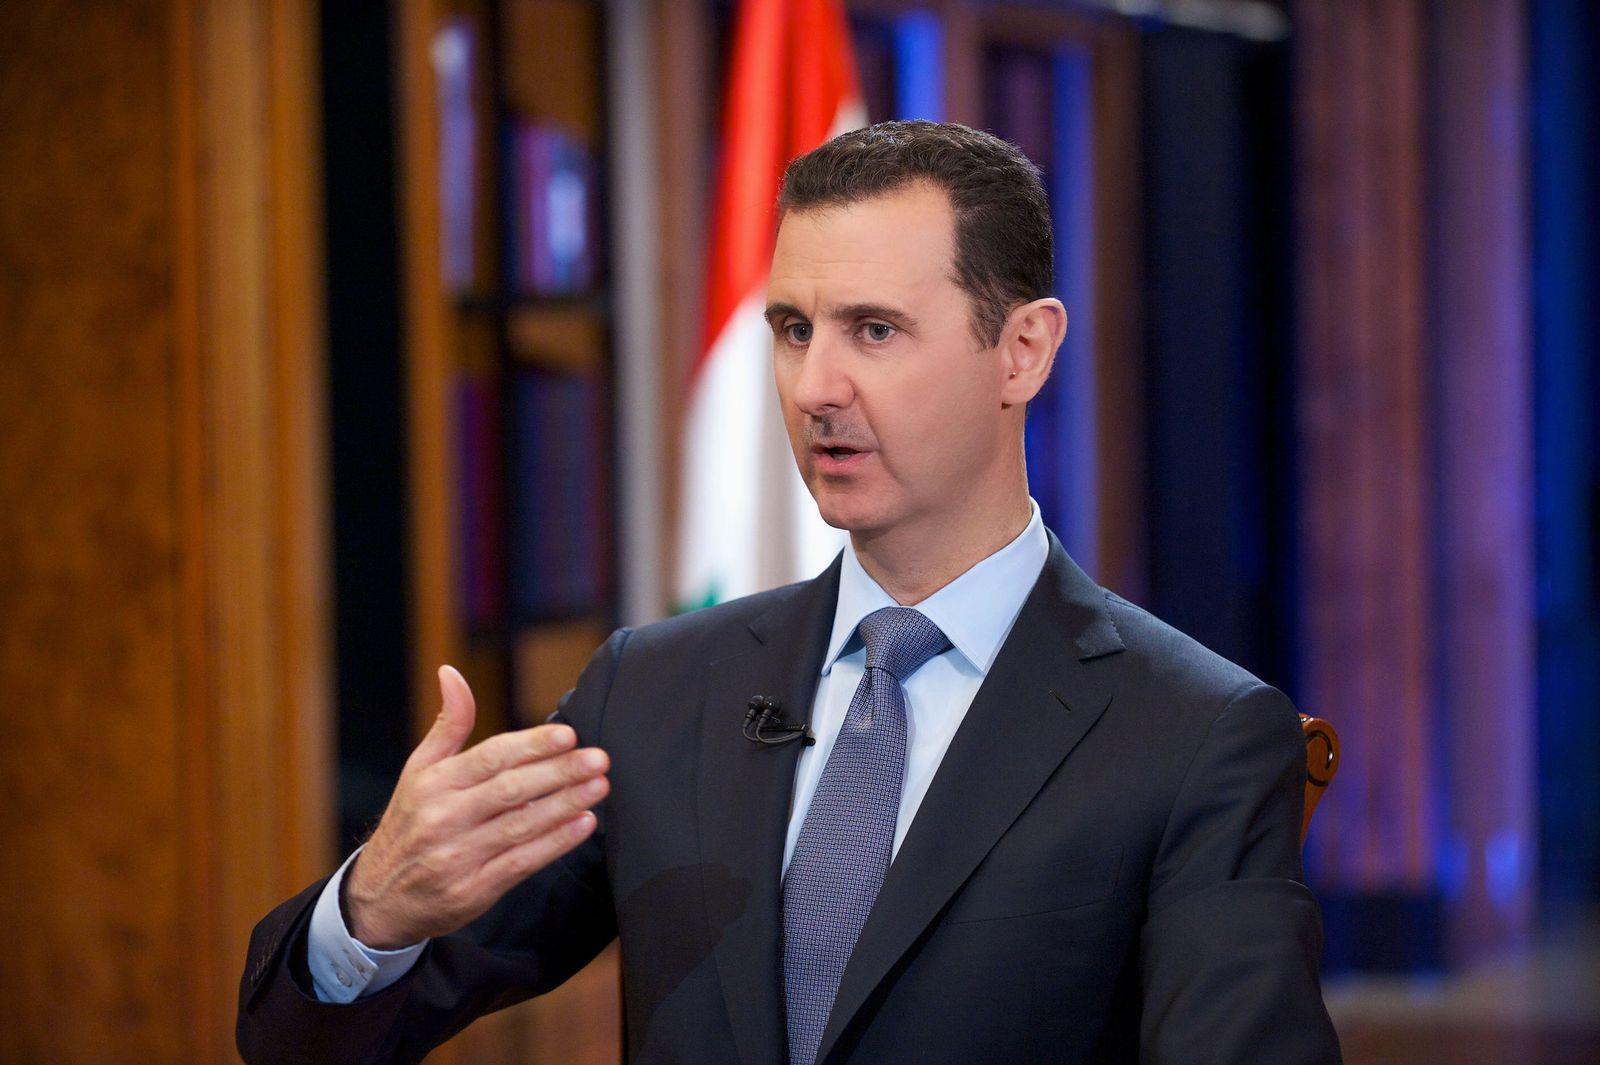 Syrien/Baschar al-Assad